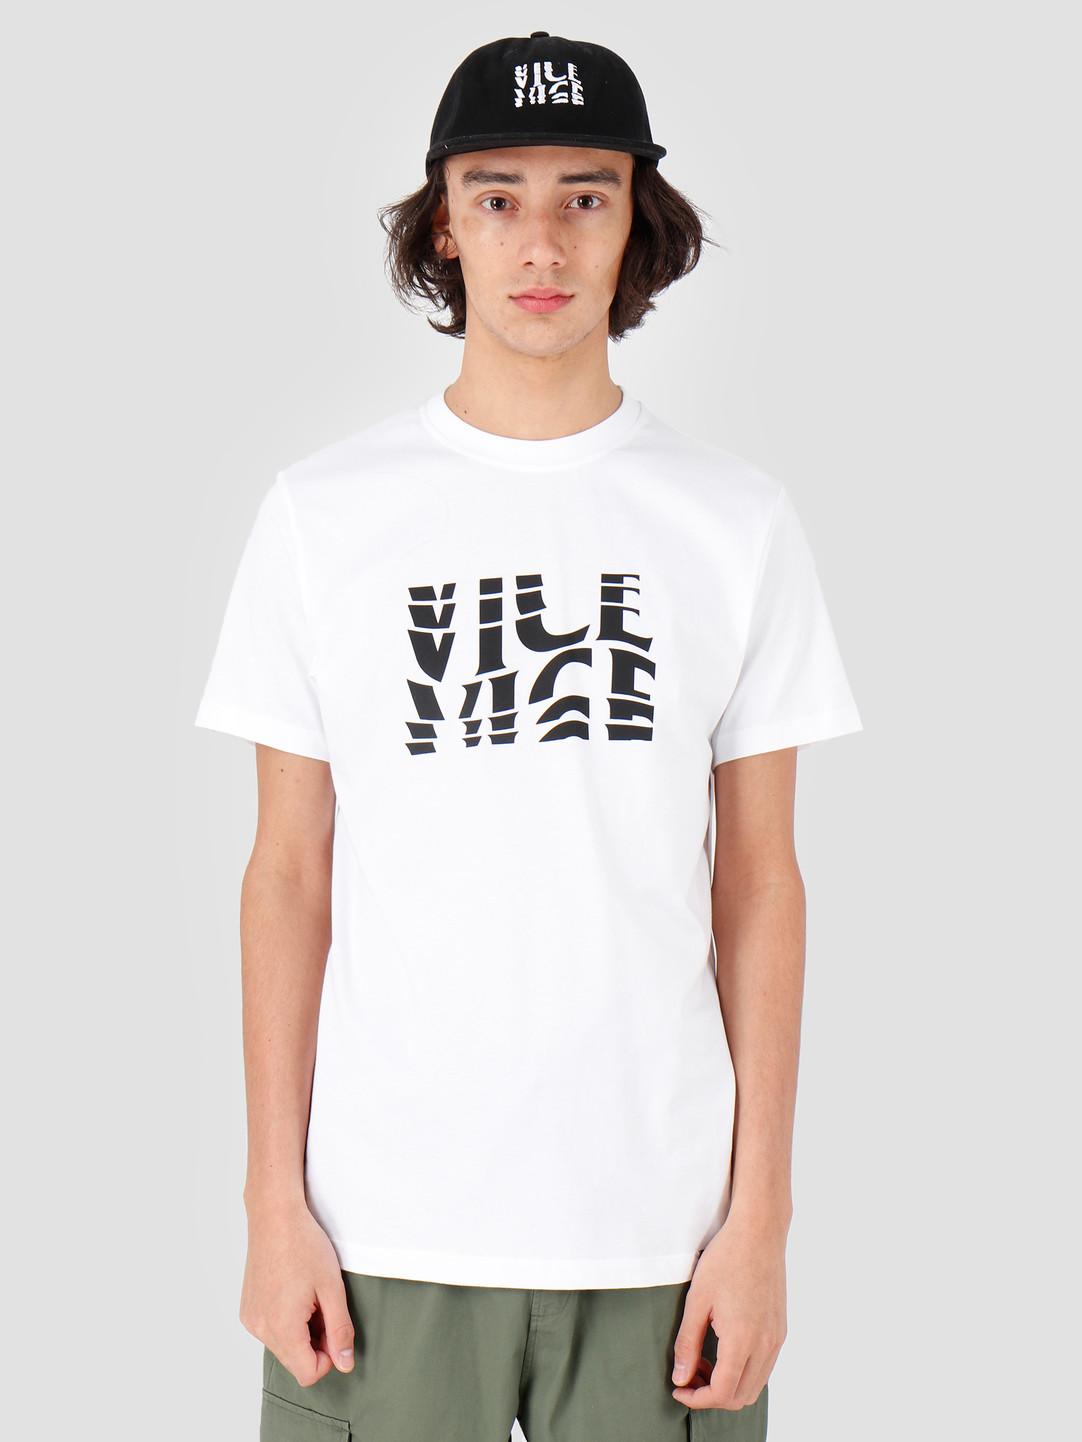 Vice VICE Wave T-shirt White Black